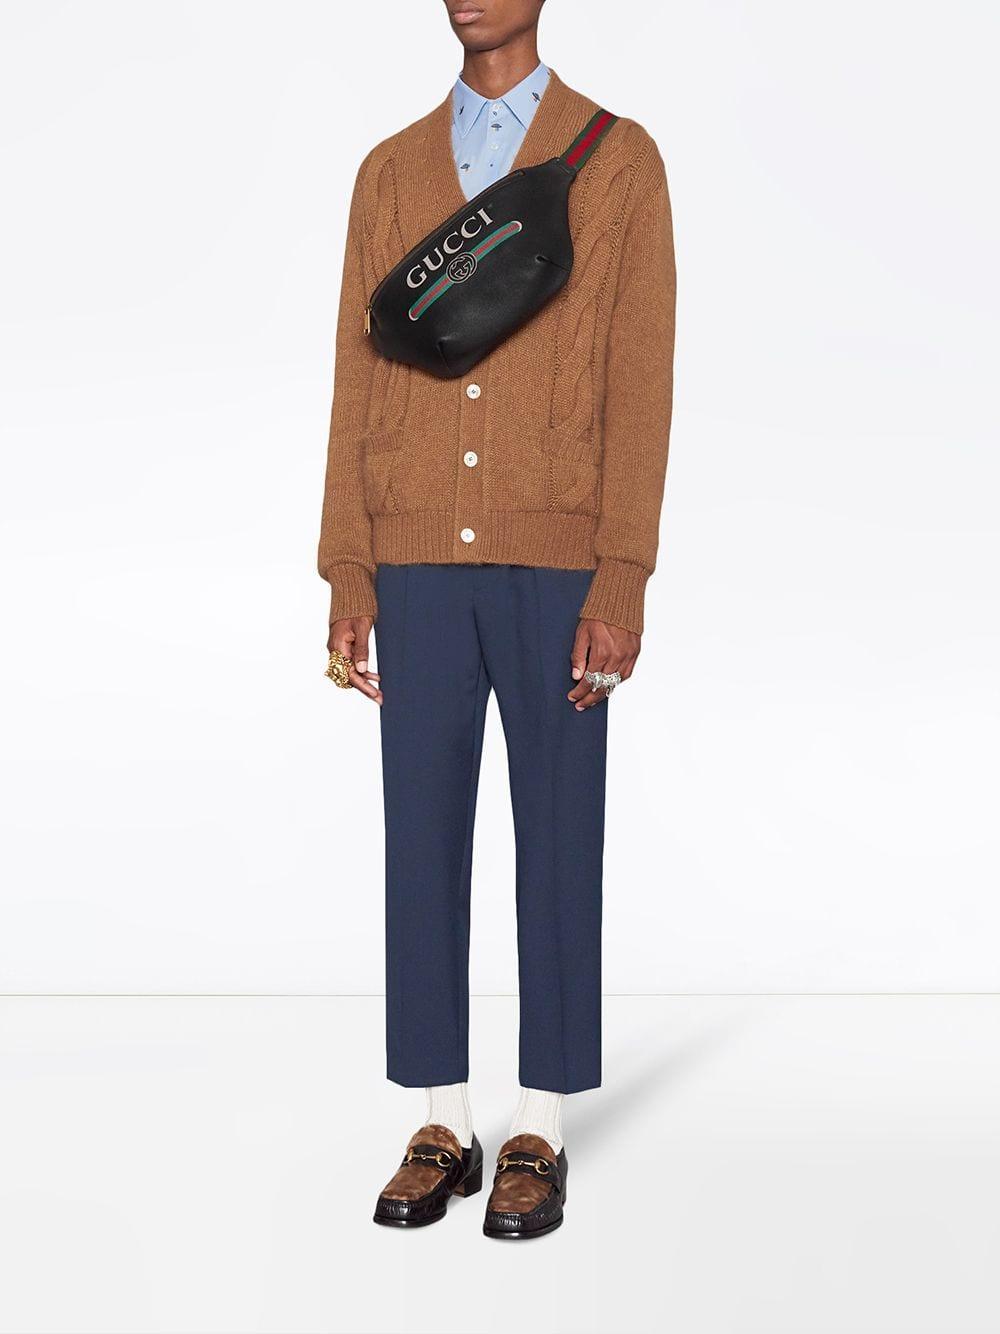 d8f7a268fc4ac1 Gucci Black Print Leather Belt Bag in Black for Men - Lyst